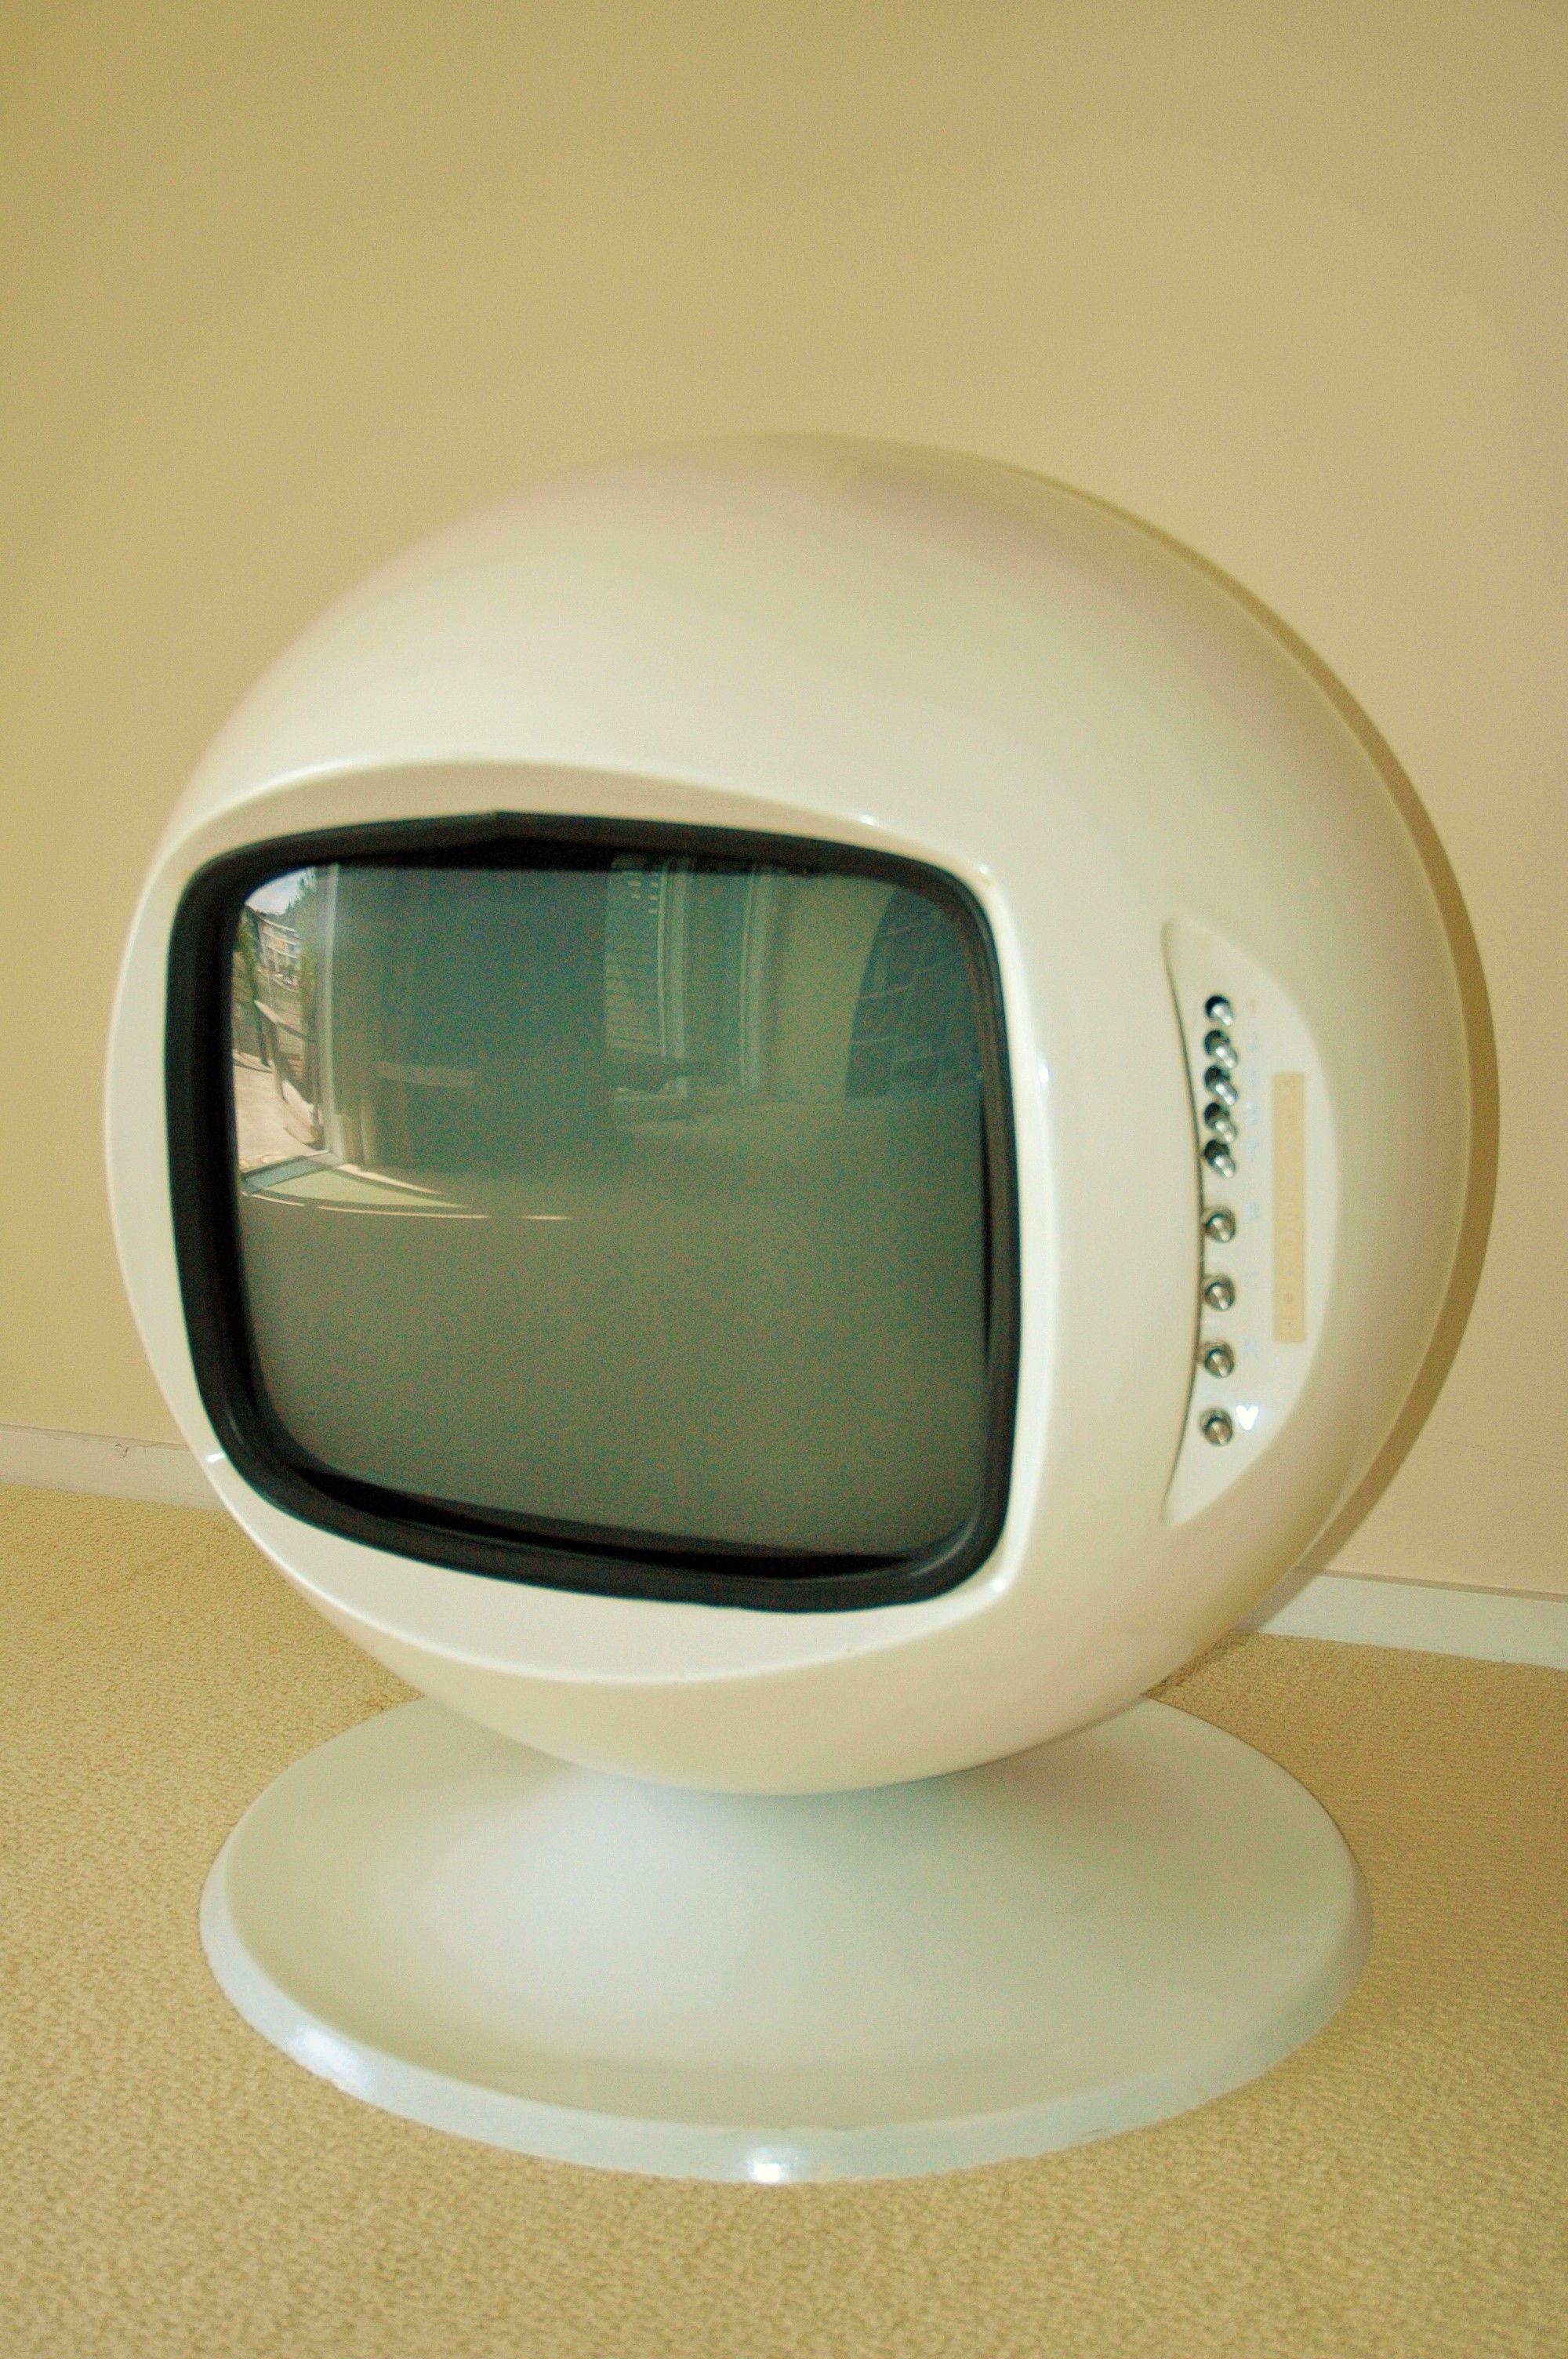 Sanyo Tv Manual Ce32ld47 B